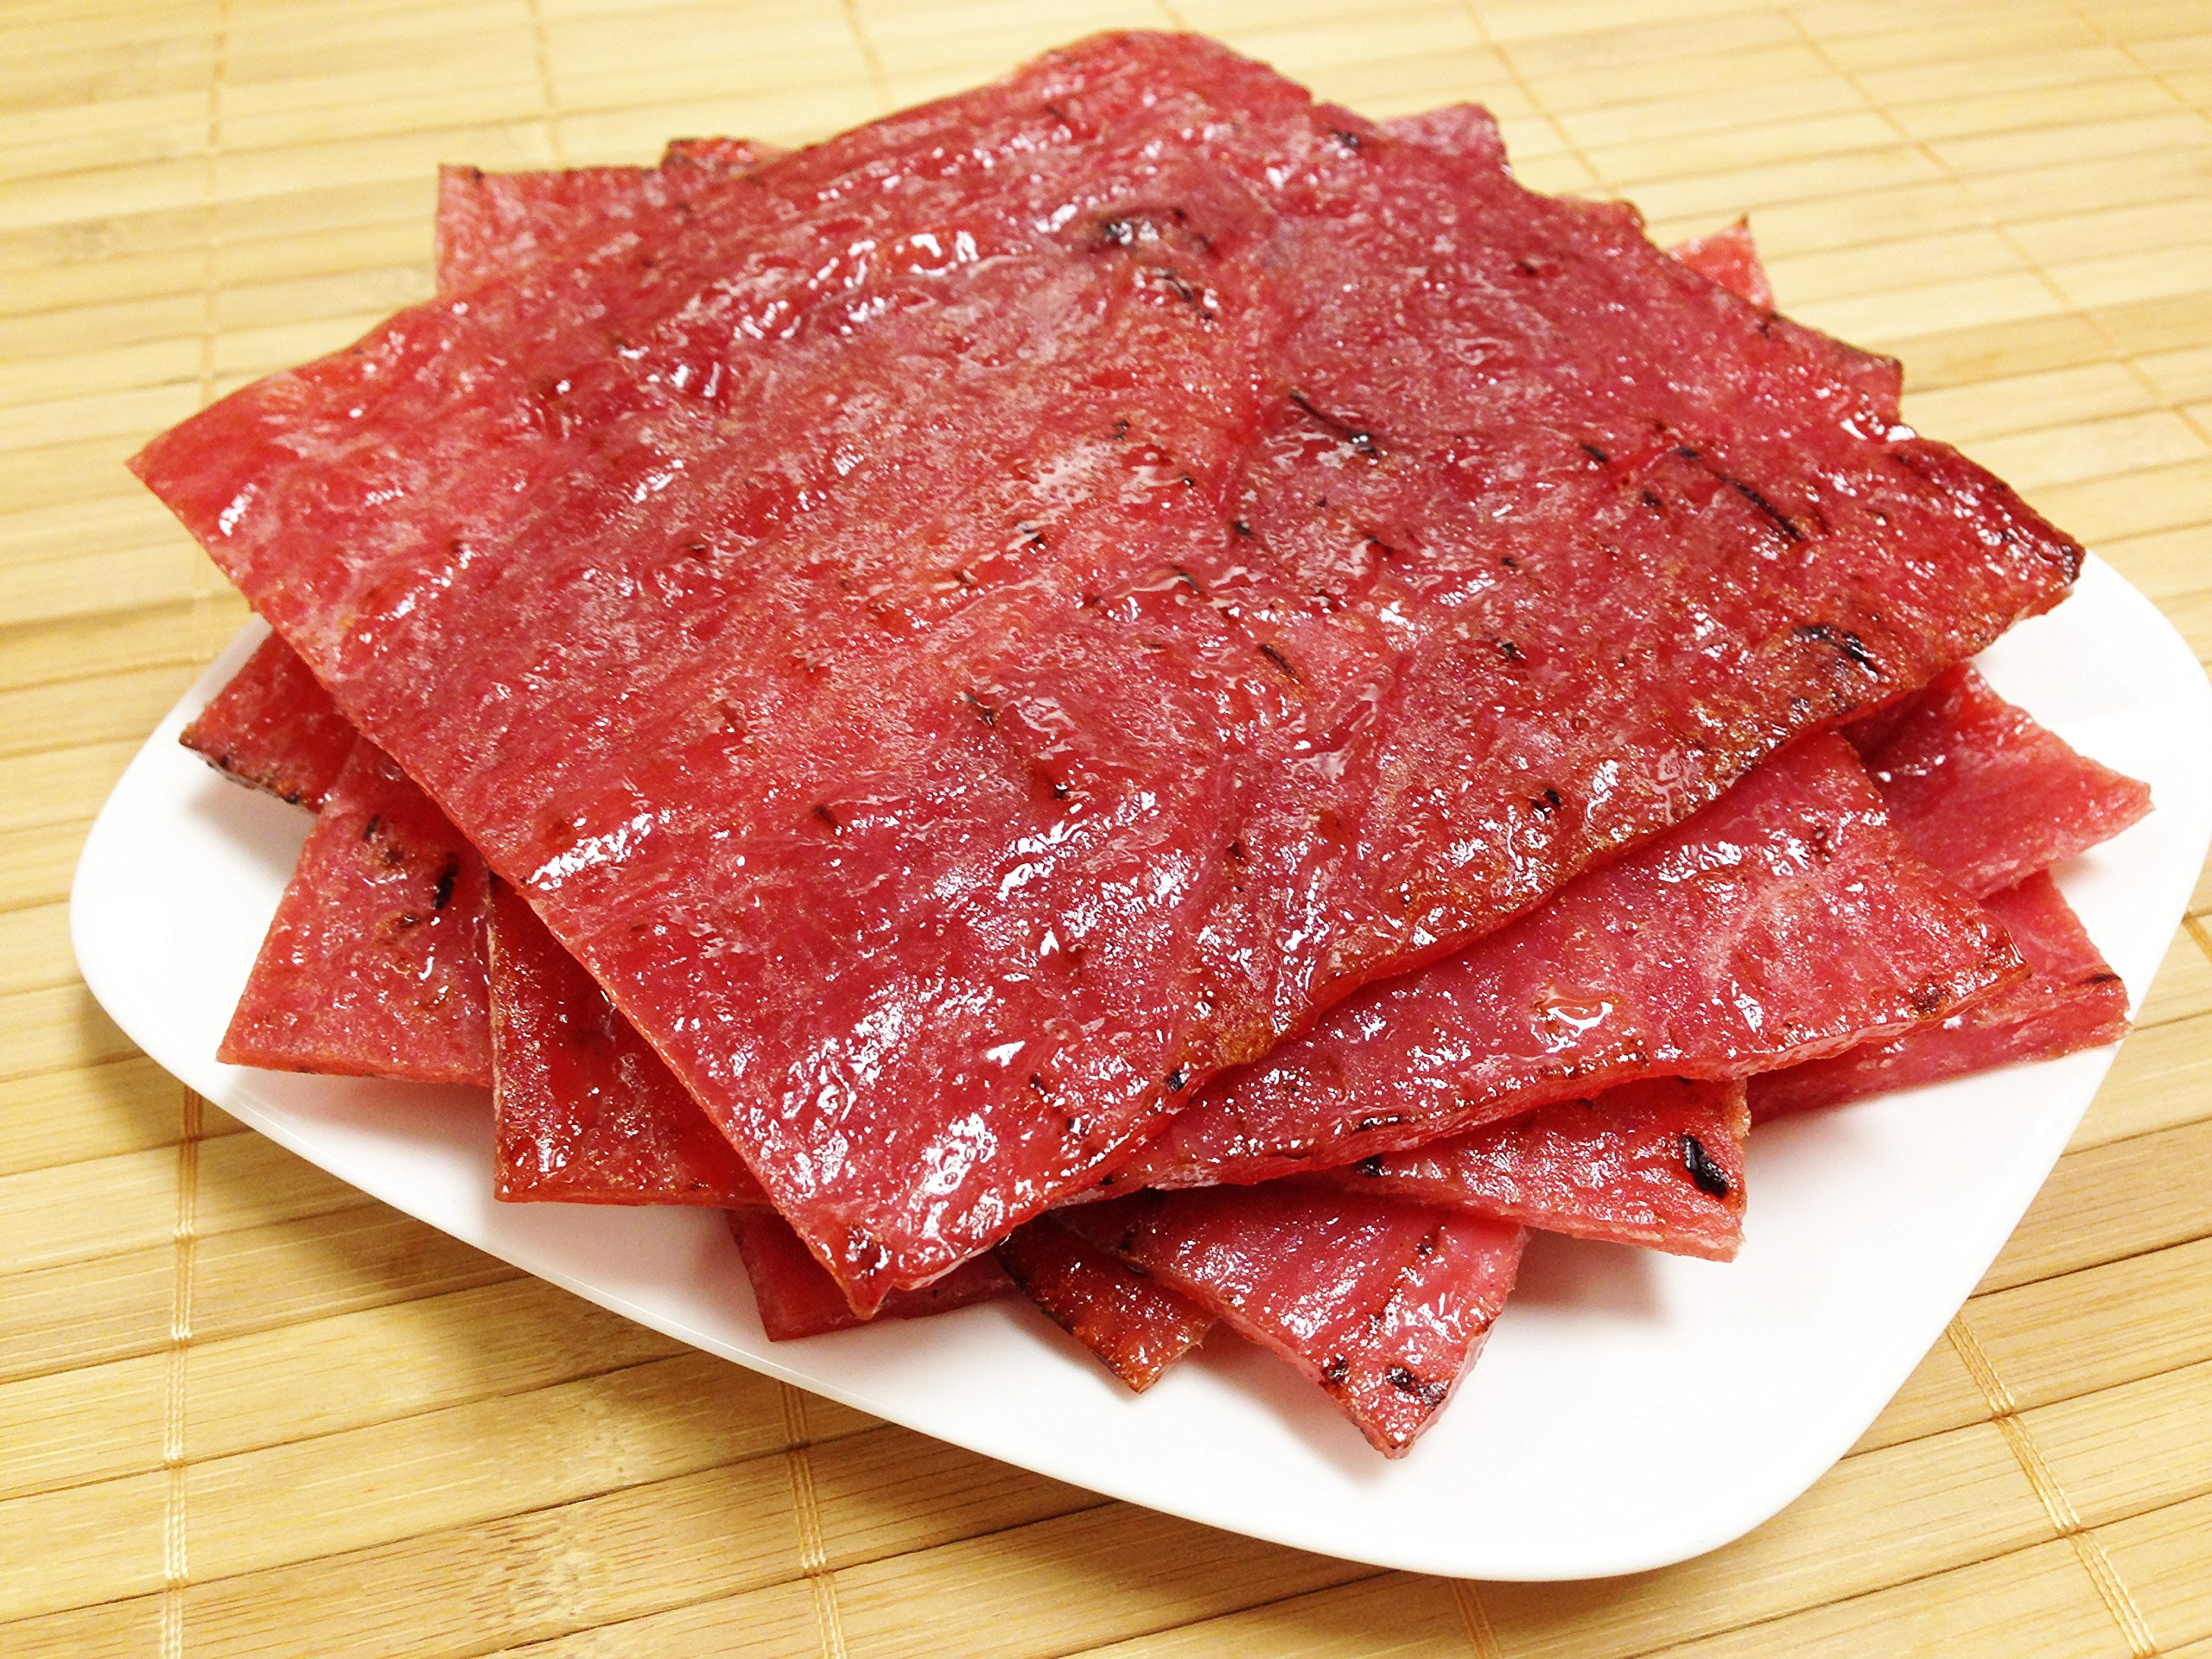 "Made to Order Fire-Grilled Asian Pork Jerky (Original Flavor - 8 Ounce) aka Singapore Bak Kwa - Los Angeles Times ""Handmade Gift"" Winner"